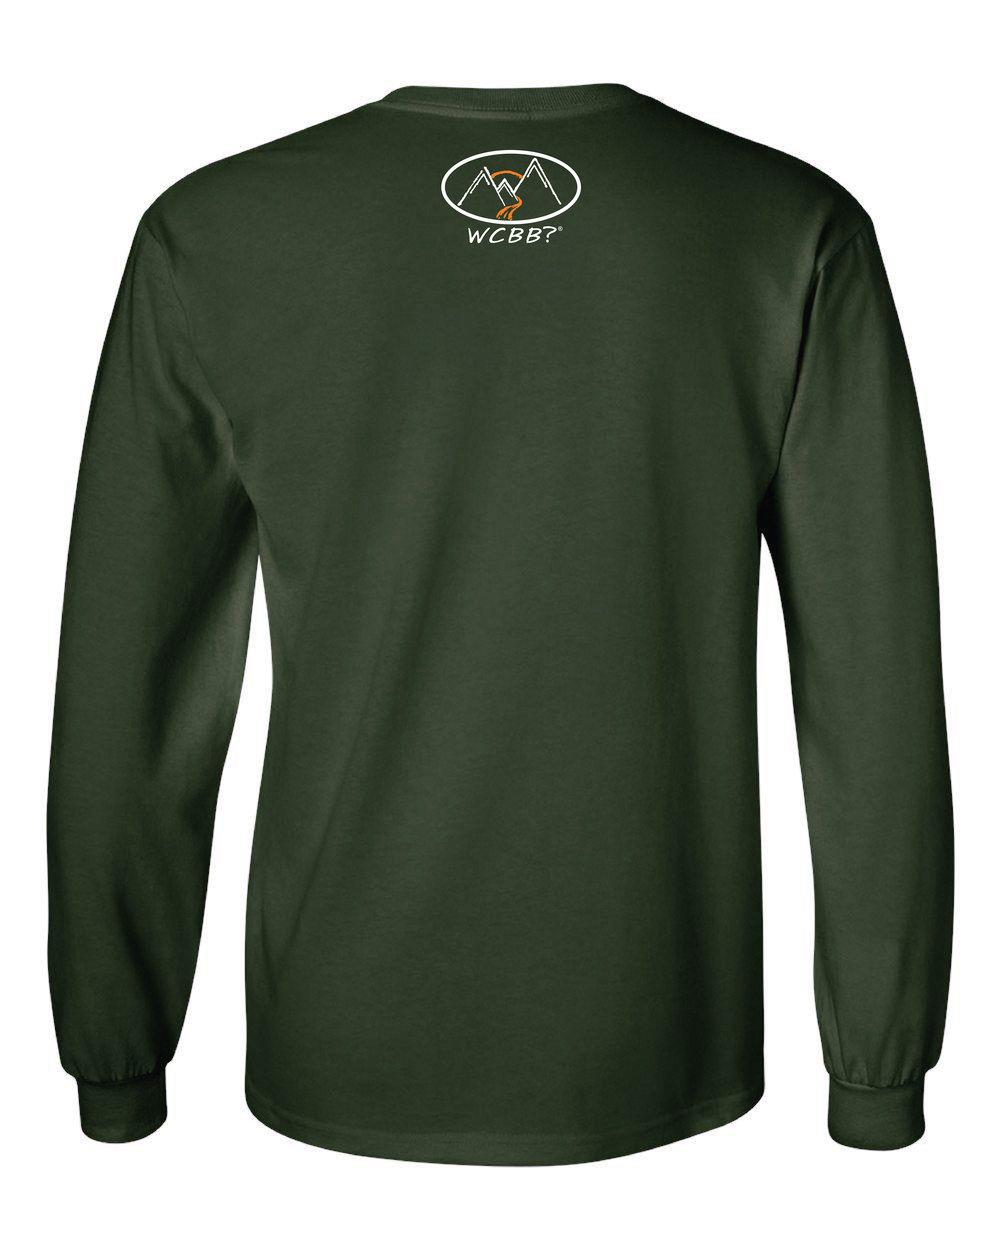 WCBB LS Forest Tshirt - Back.jpg